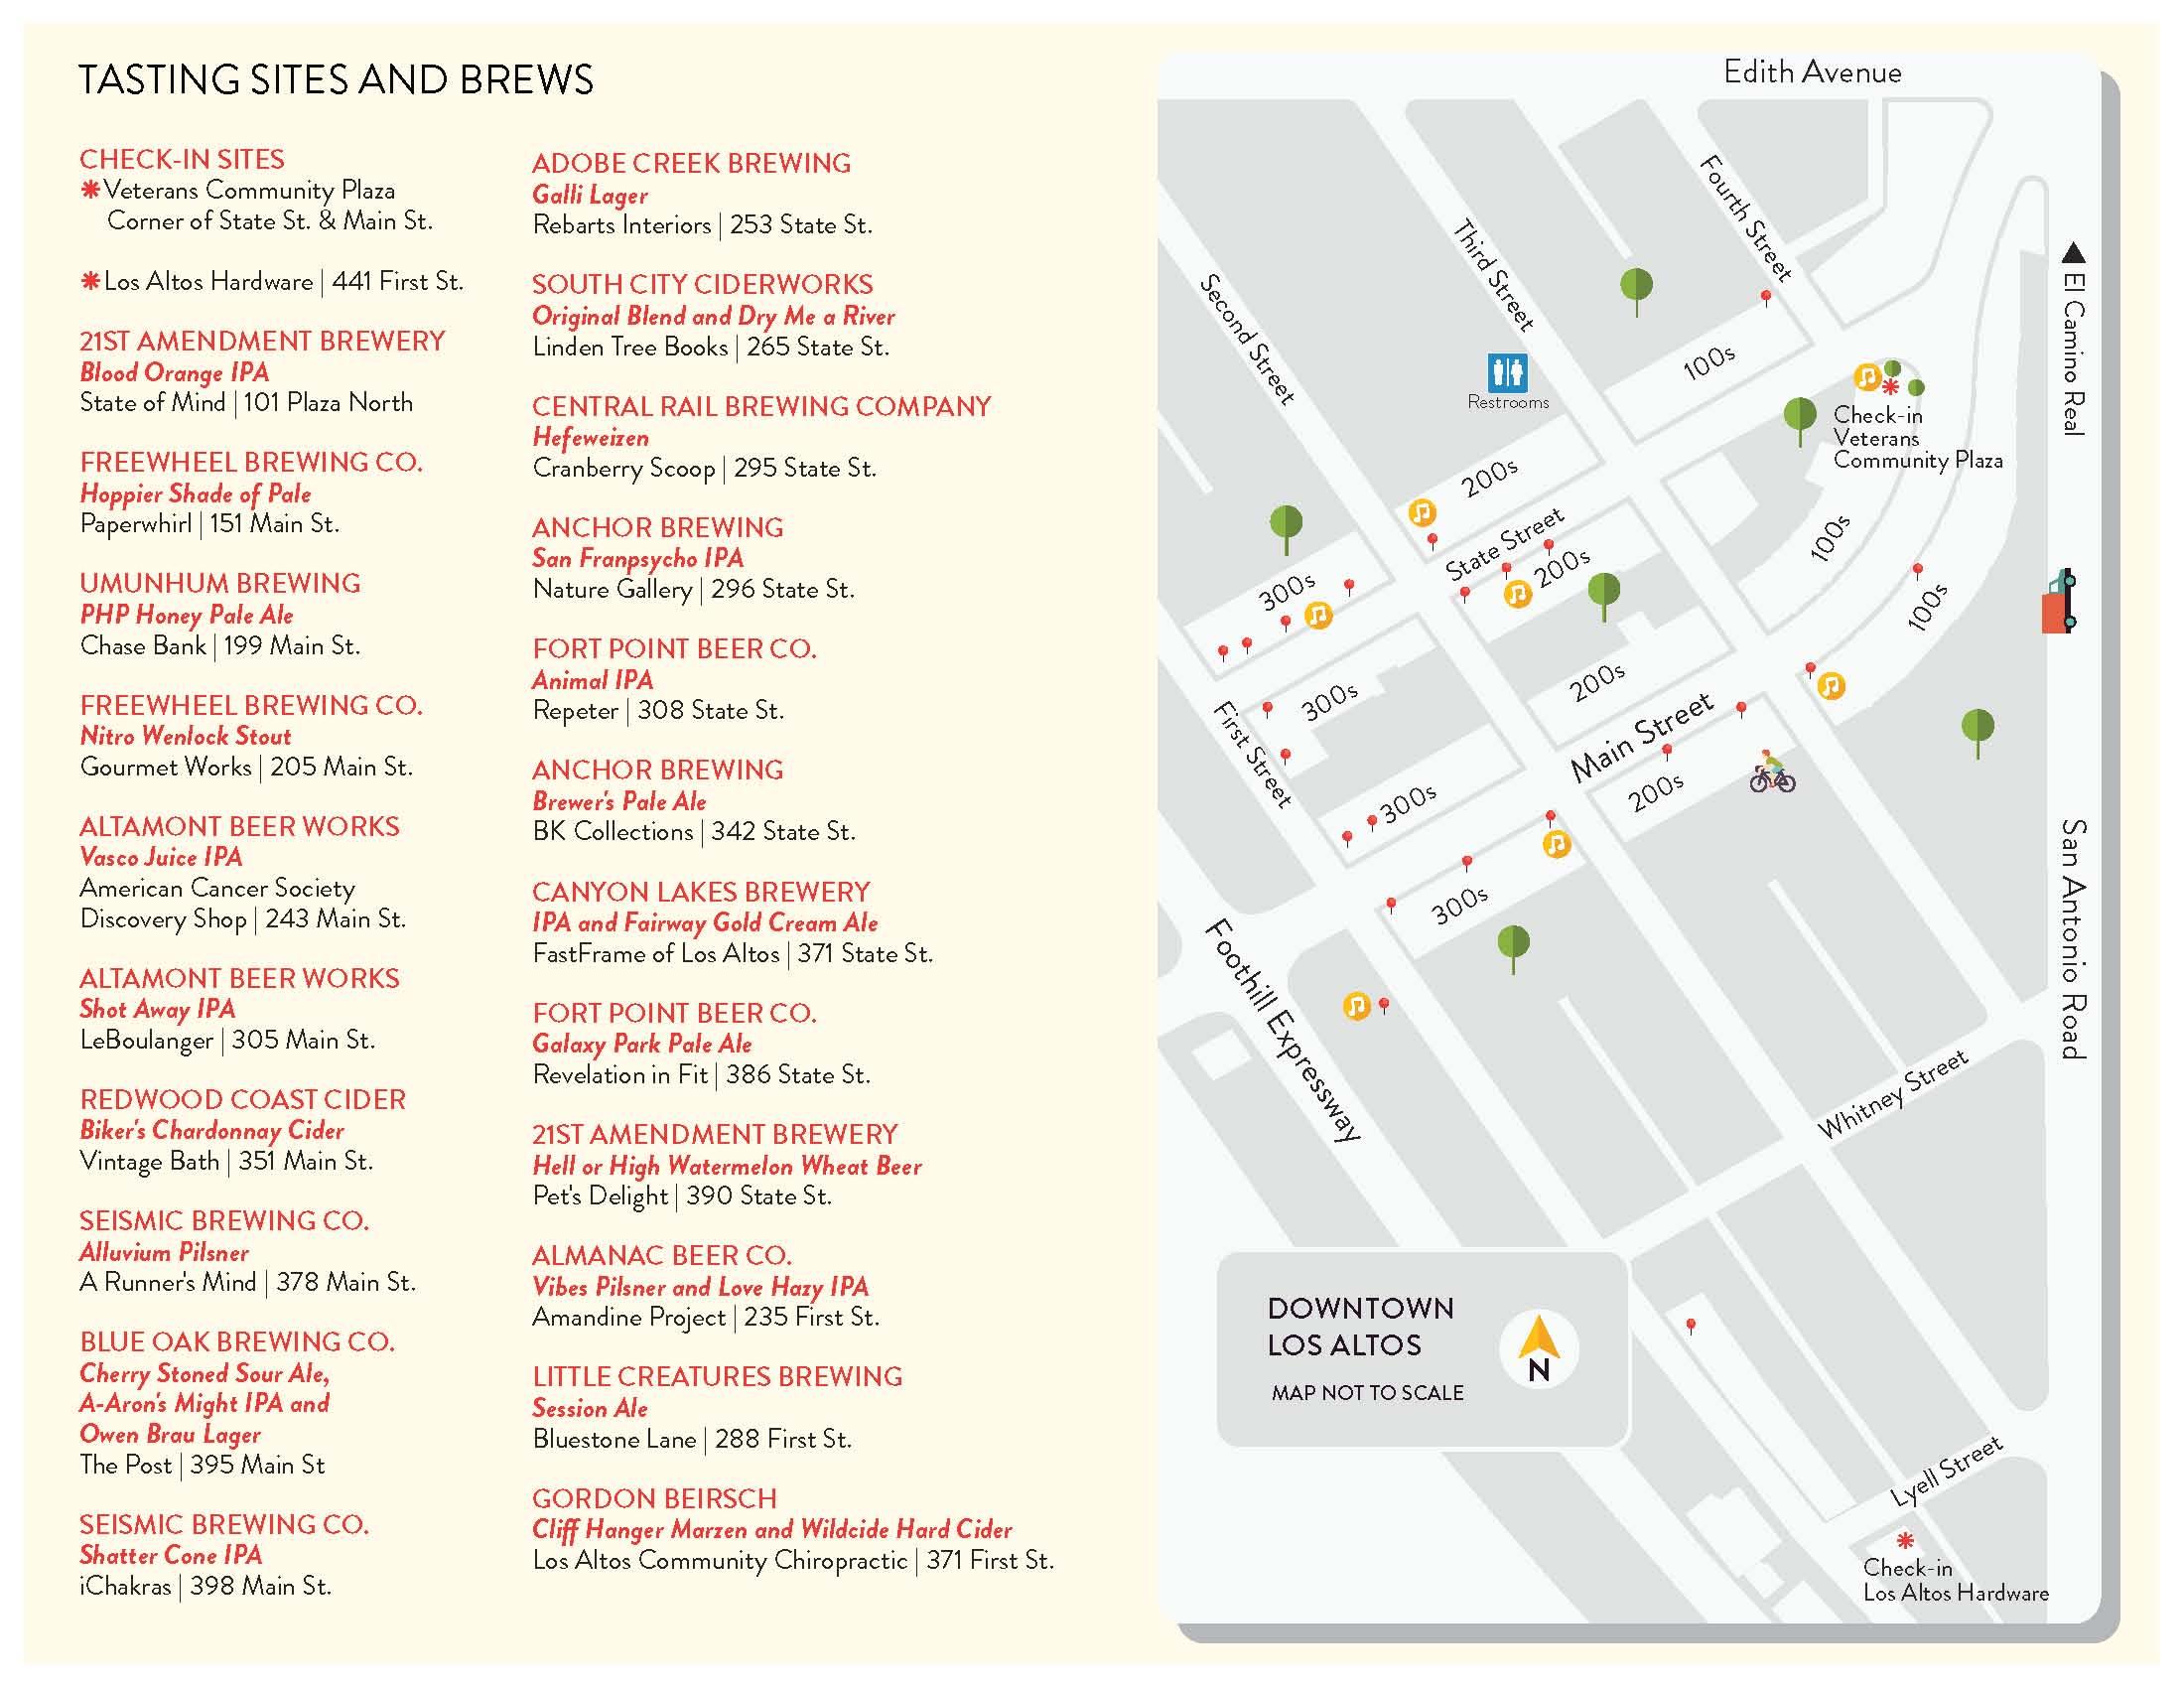 Downtown Los Altos Beer Stroll Tasting Map